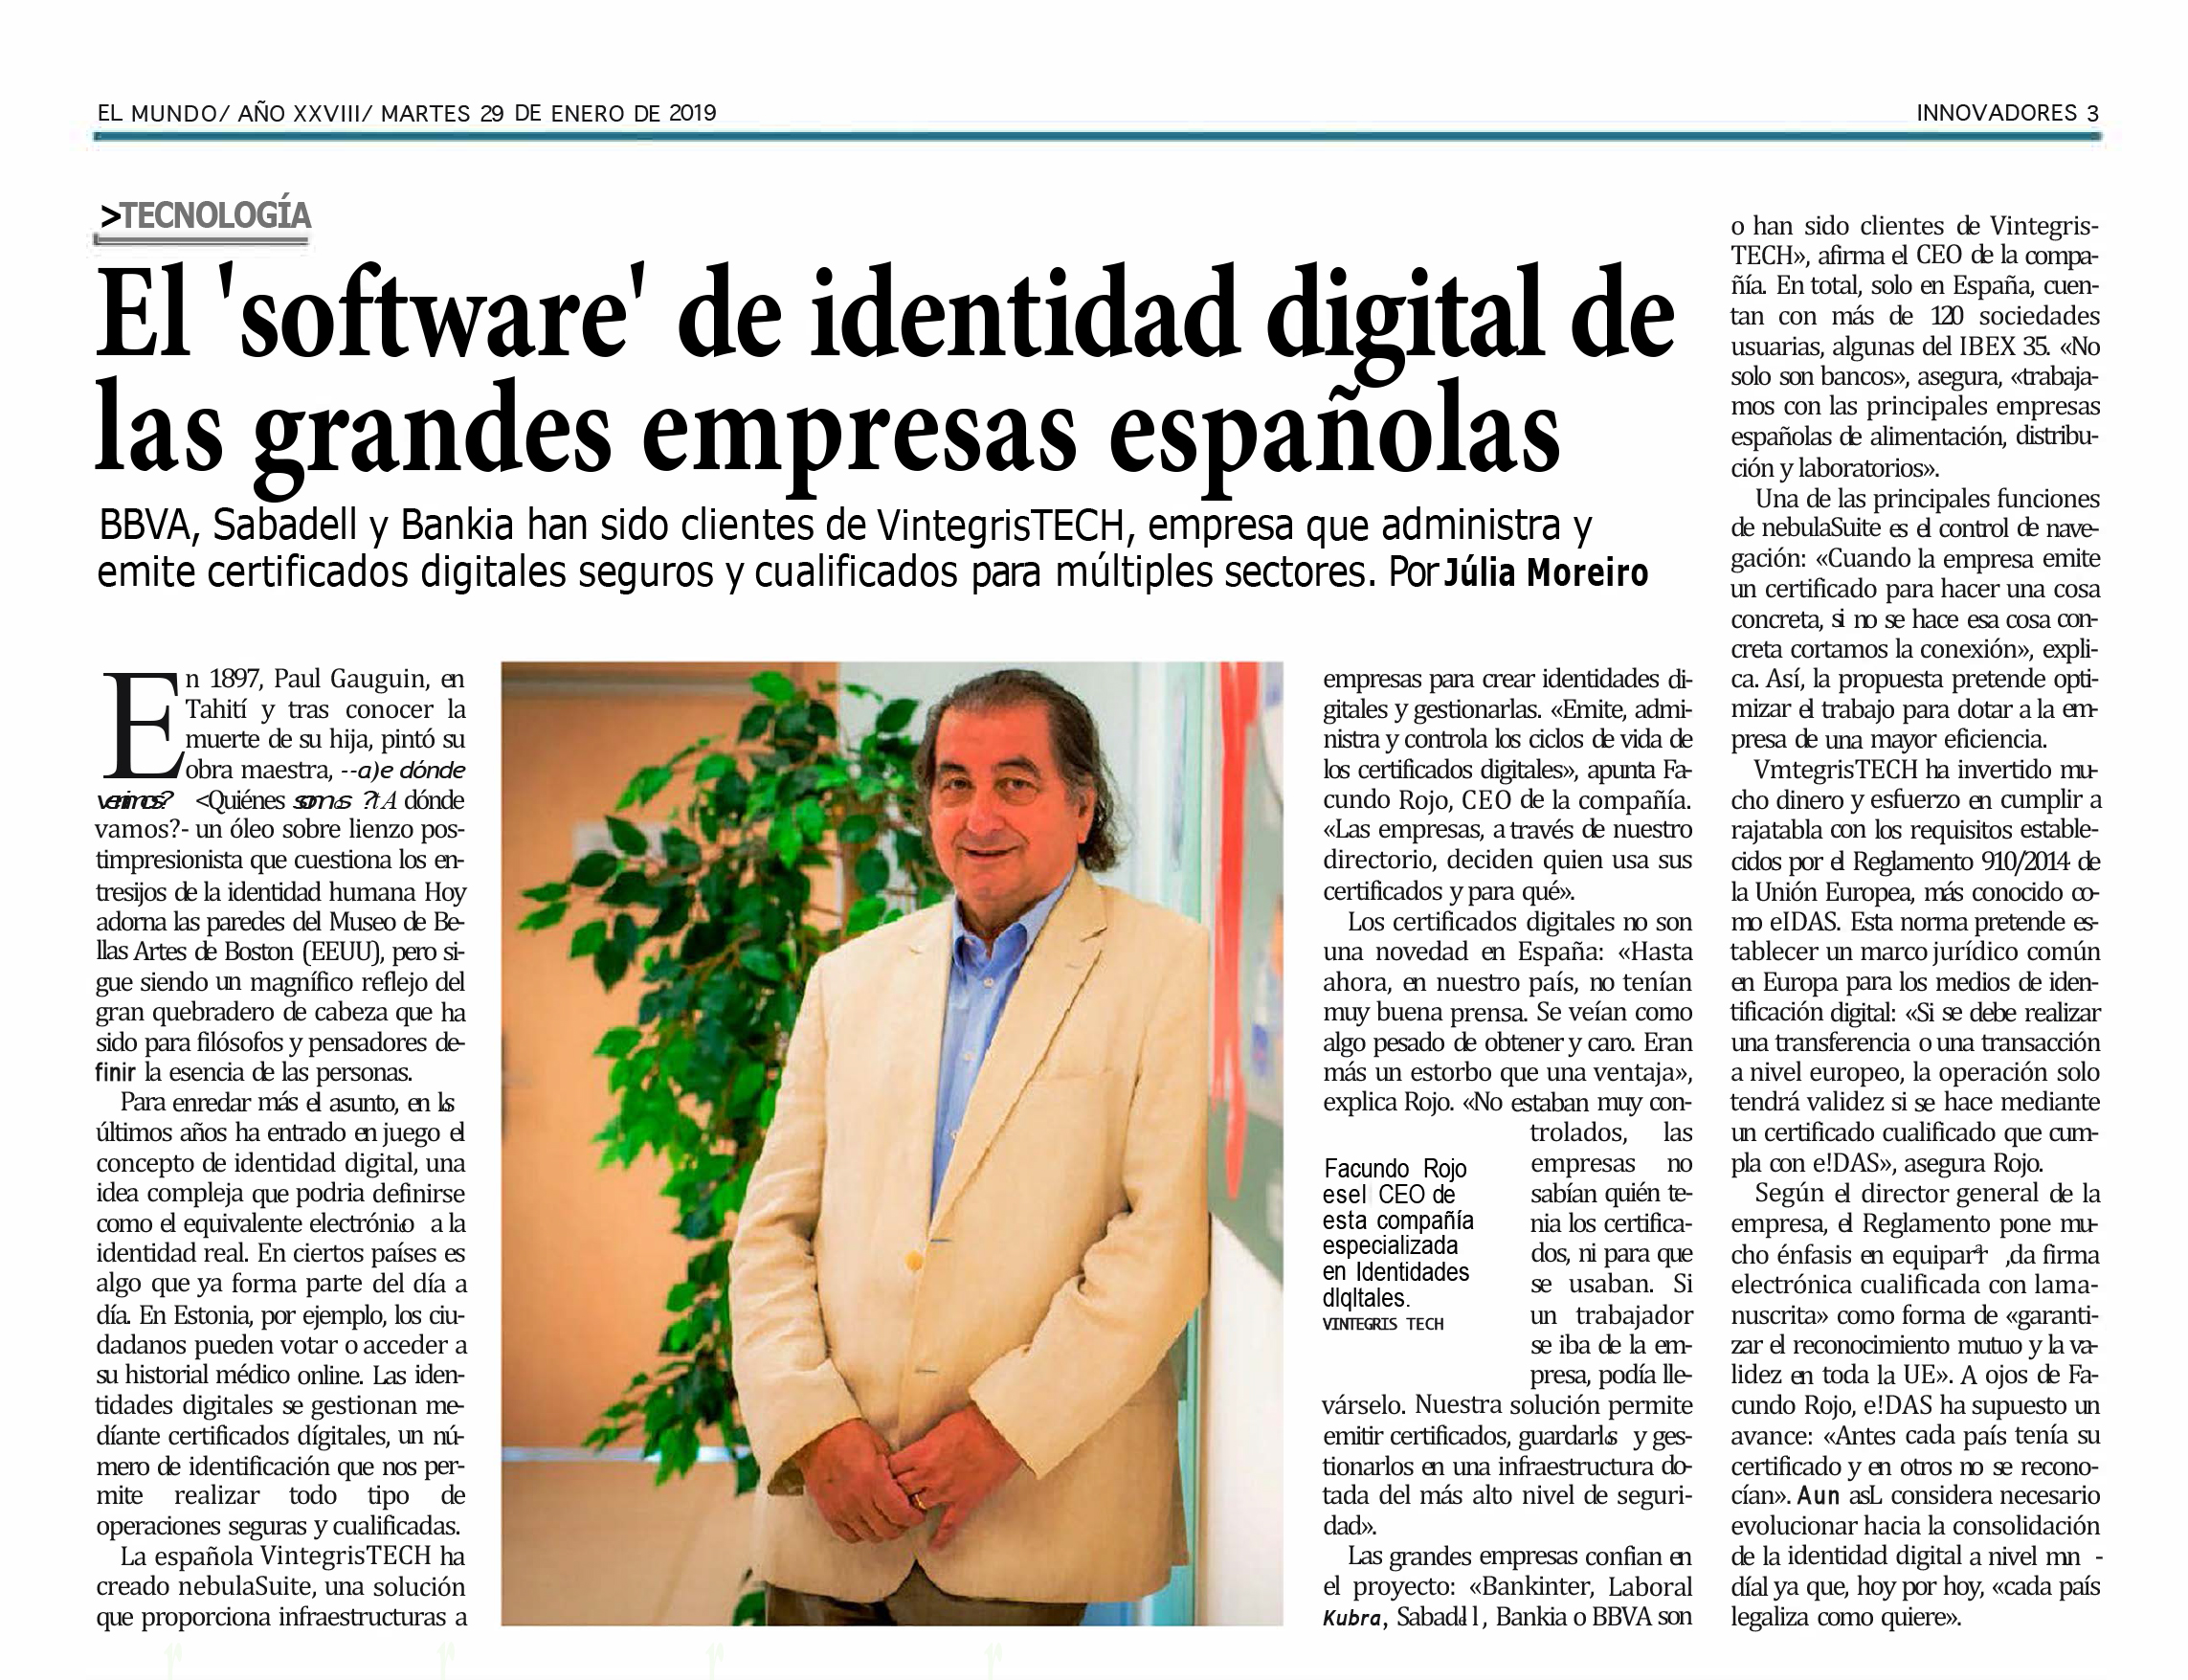 nebulaSUITE for the creation and management of digital identity_El Mundo January 2019